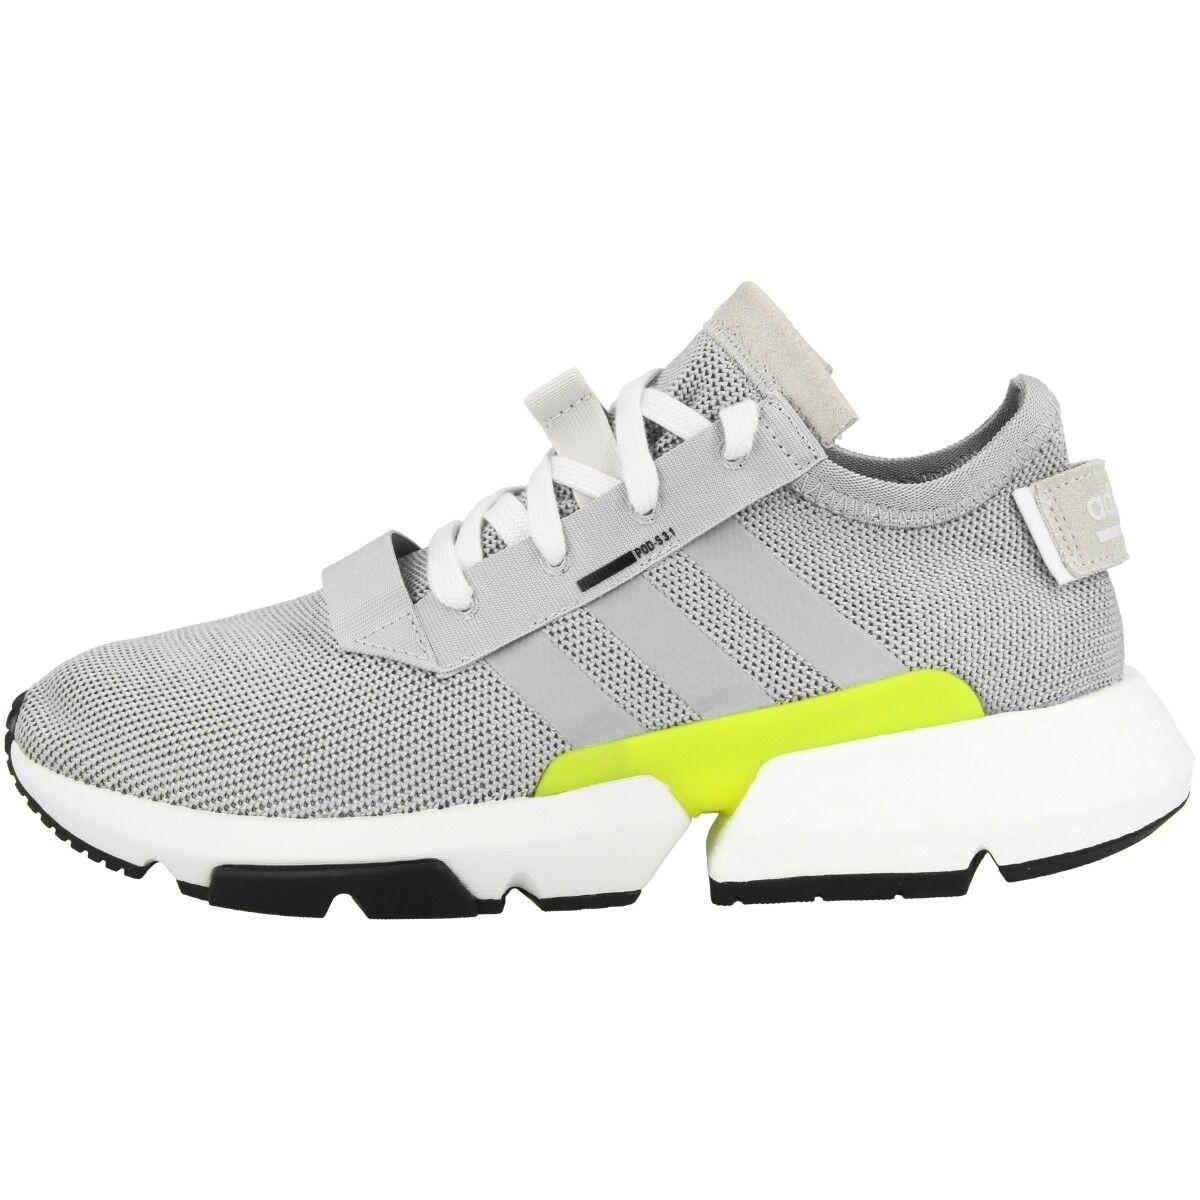 Adidas POD-S3.1 Chaussures Homme Sports et Loisirs Baskets Gris Choc Jaune